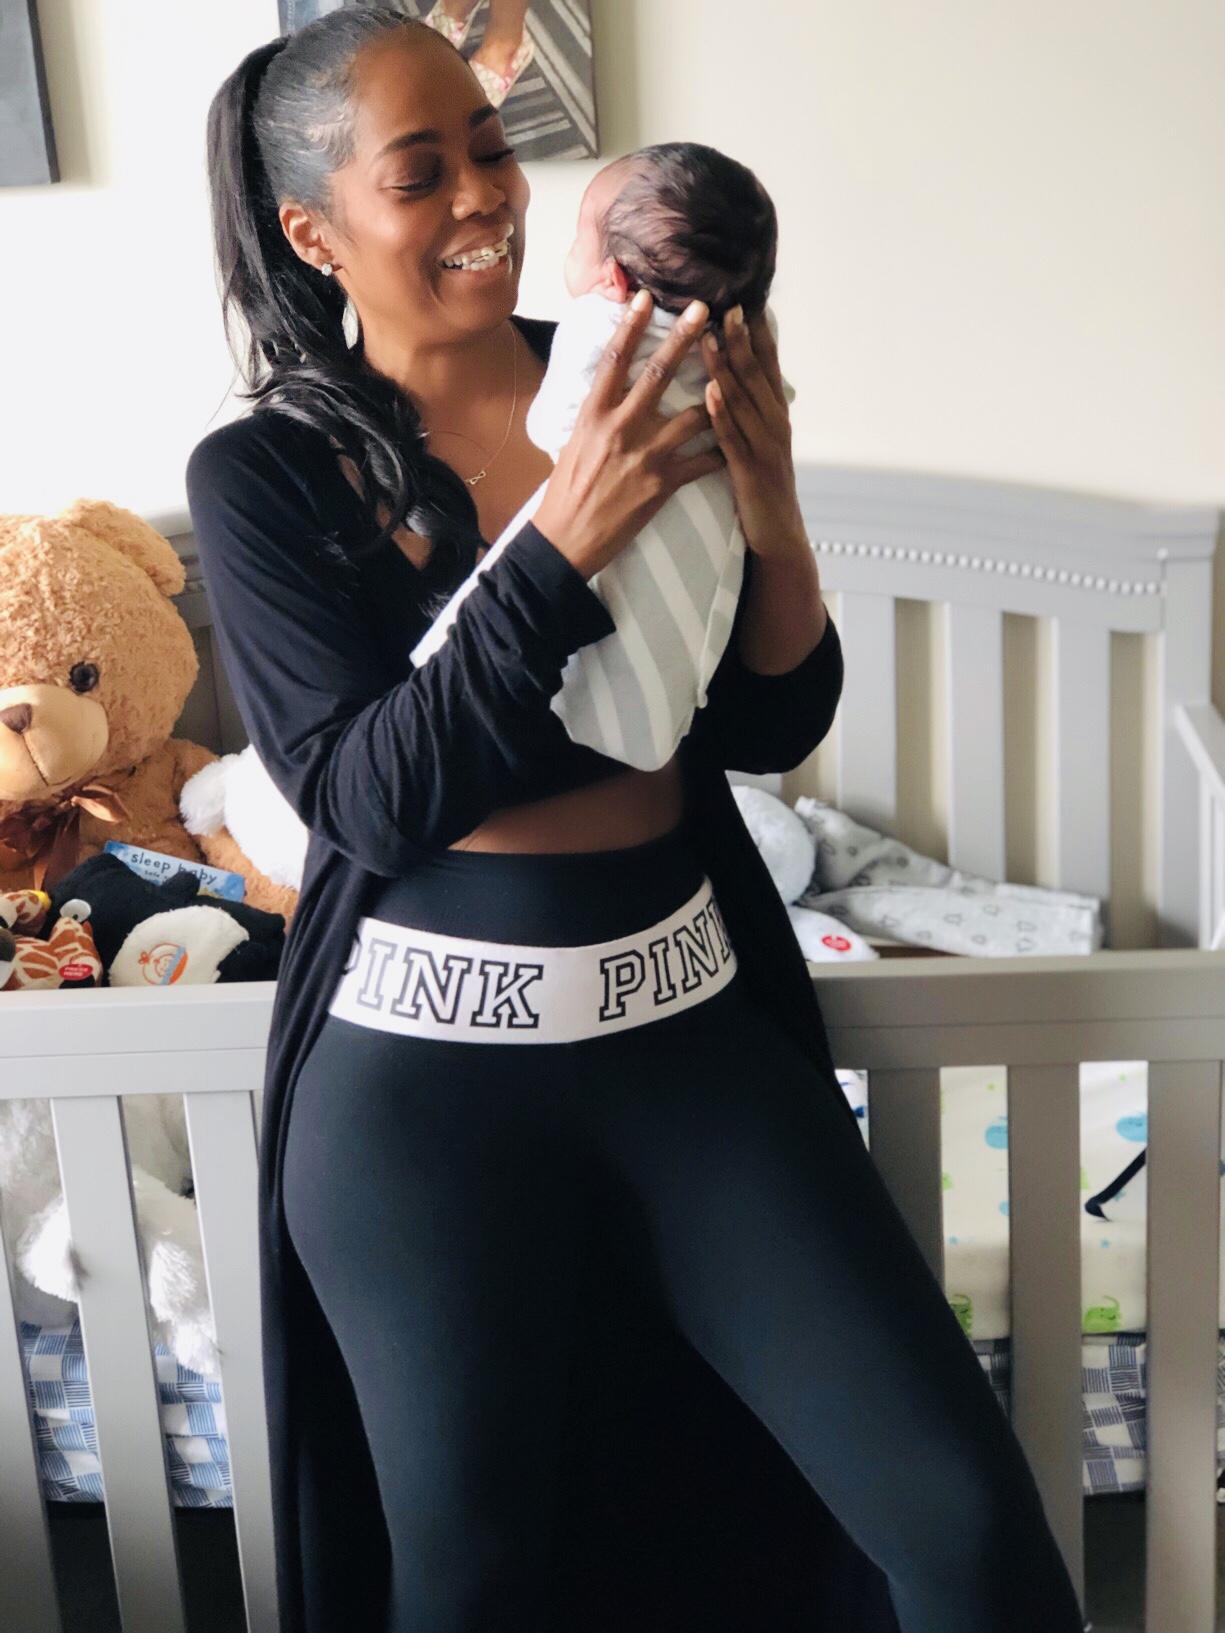 Baby Legend Turns 1 Week Old